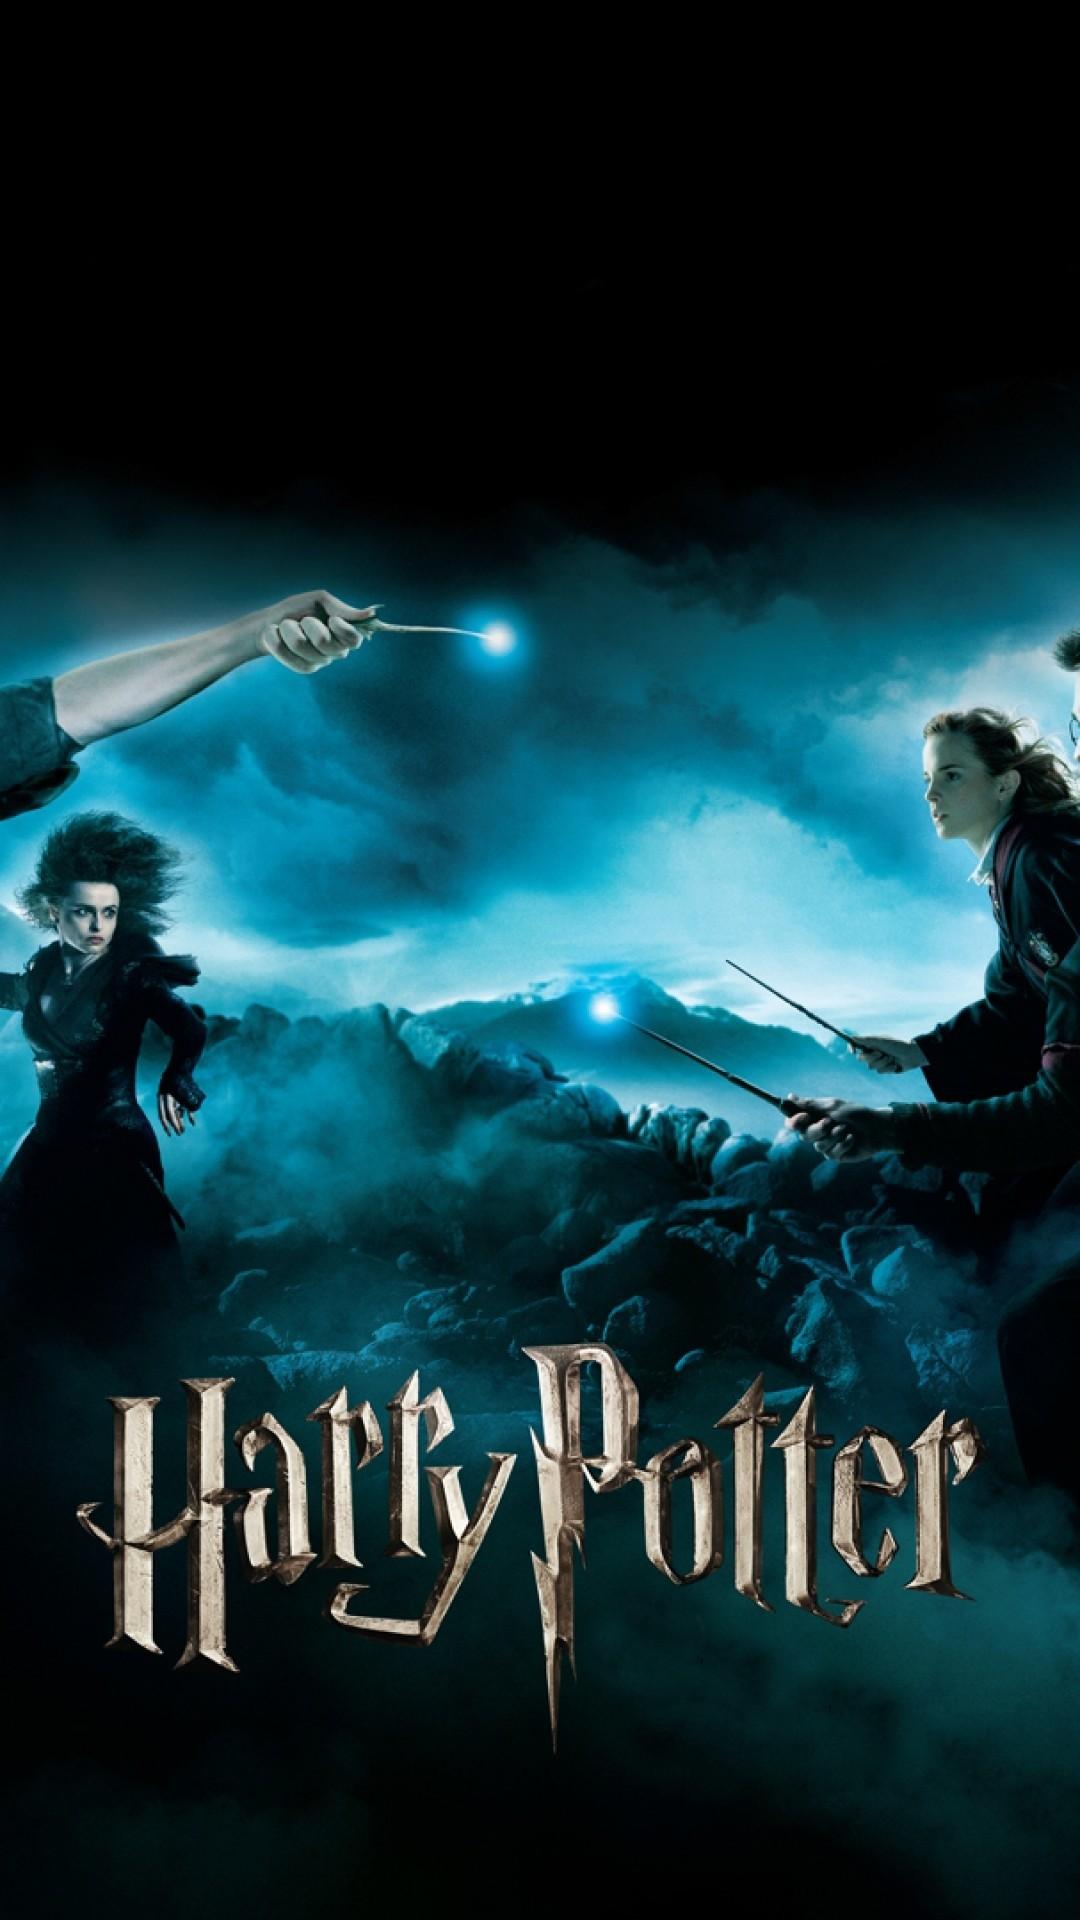 … Harry Potter Wallpaper Iphone harry potter iphone wallpaper4 …